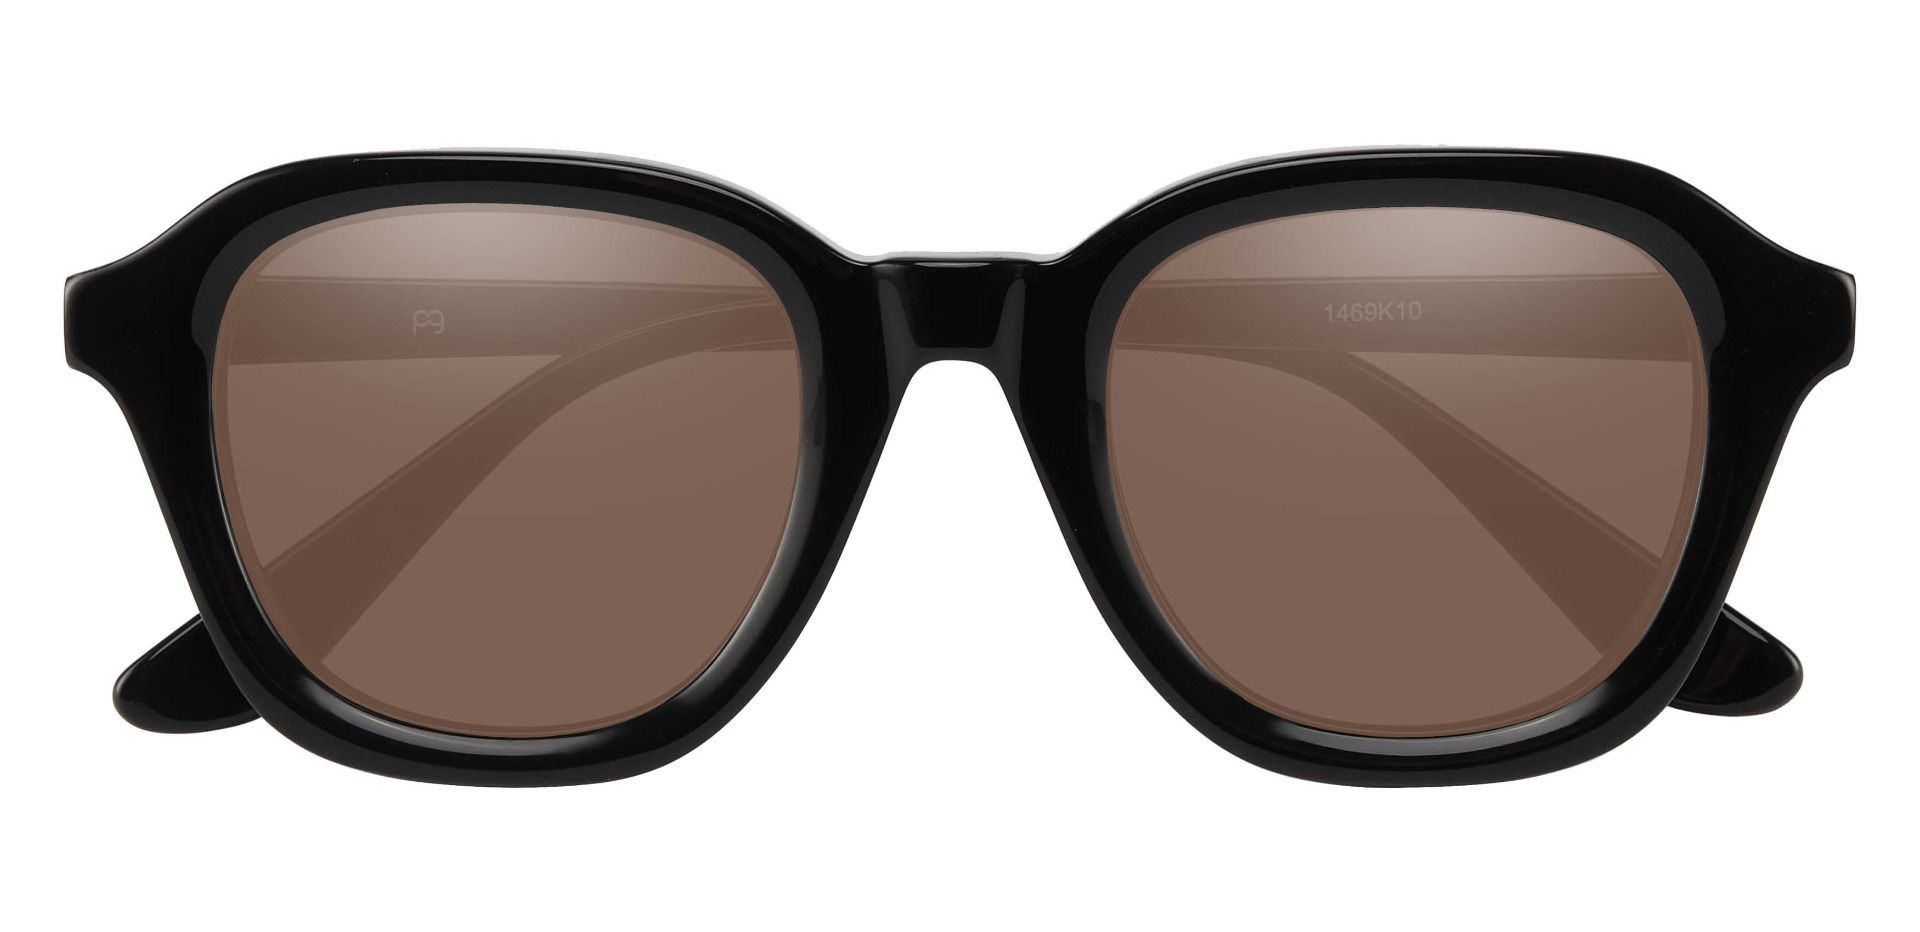 Grove Square Prescription Sunglasses - Black Frame With Brown Lenses